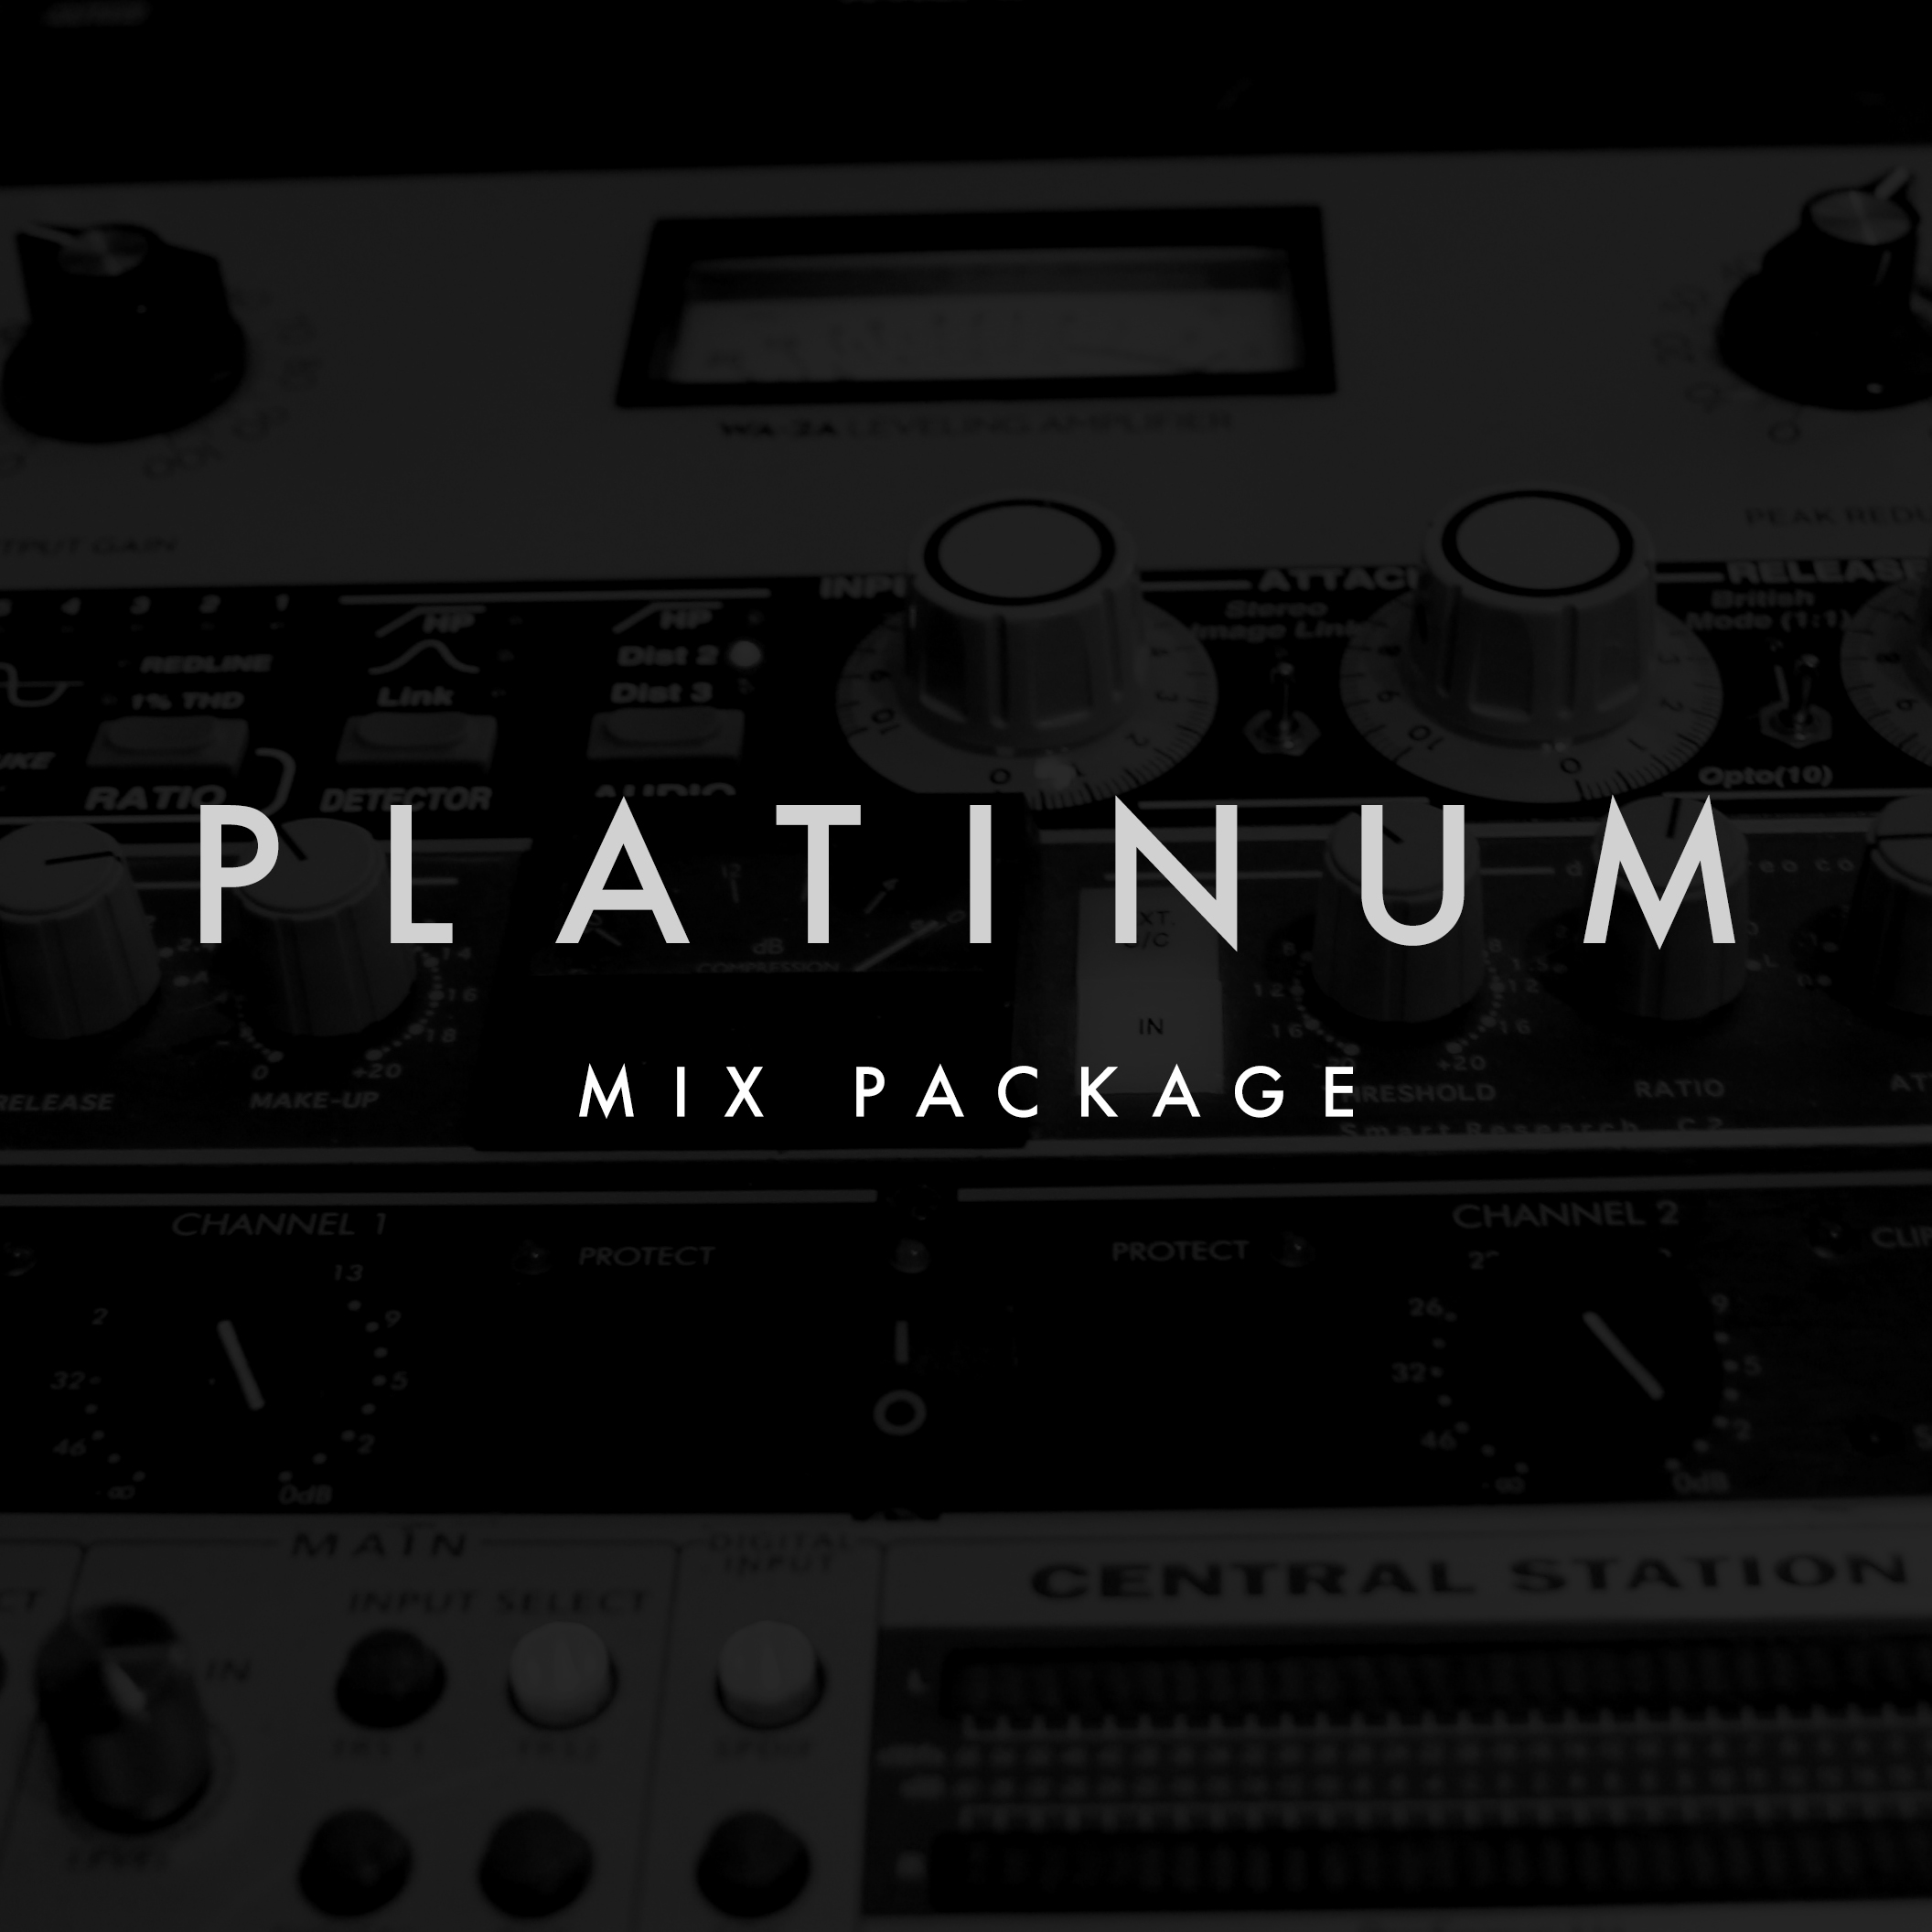 platinummix.jpg